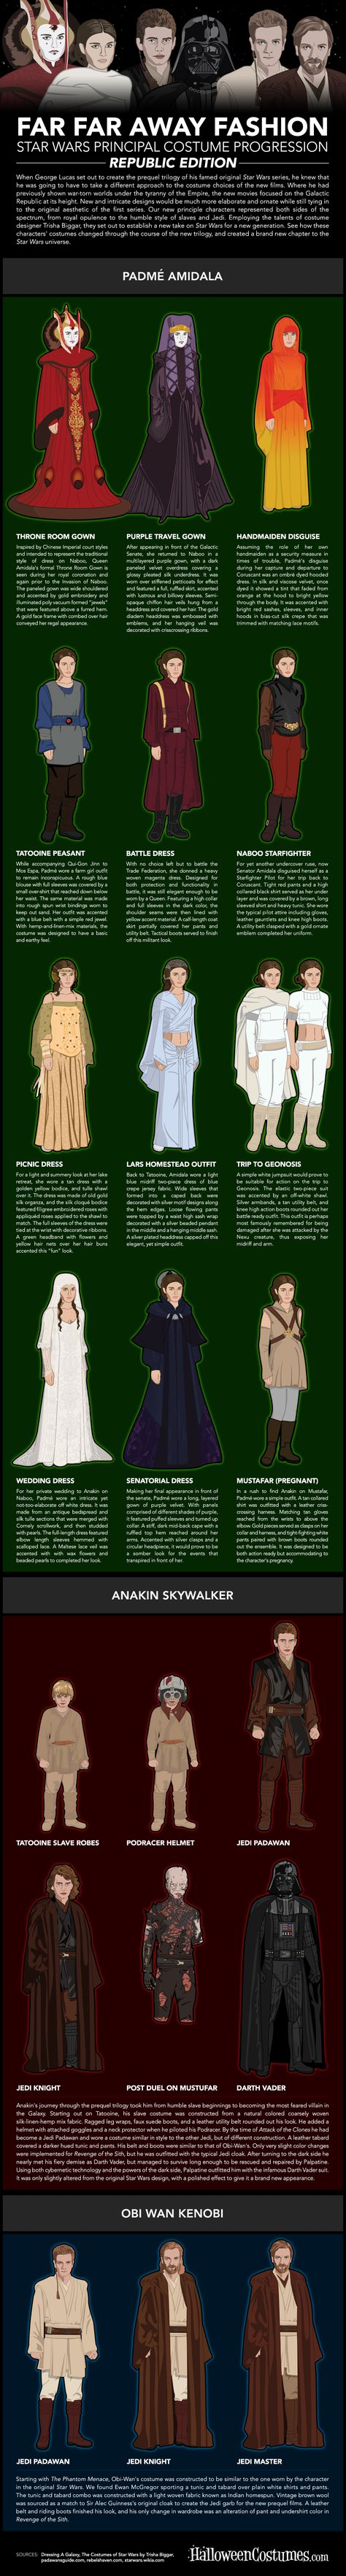 Star Wars Republic Costume Evolution Infographic